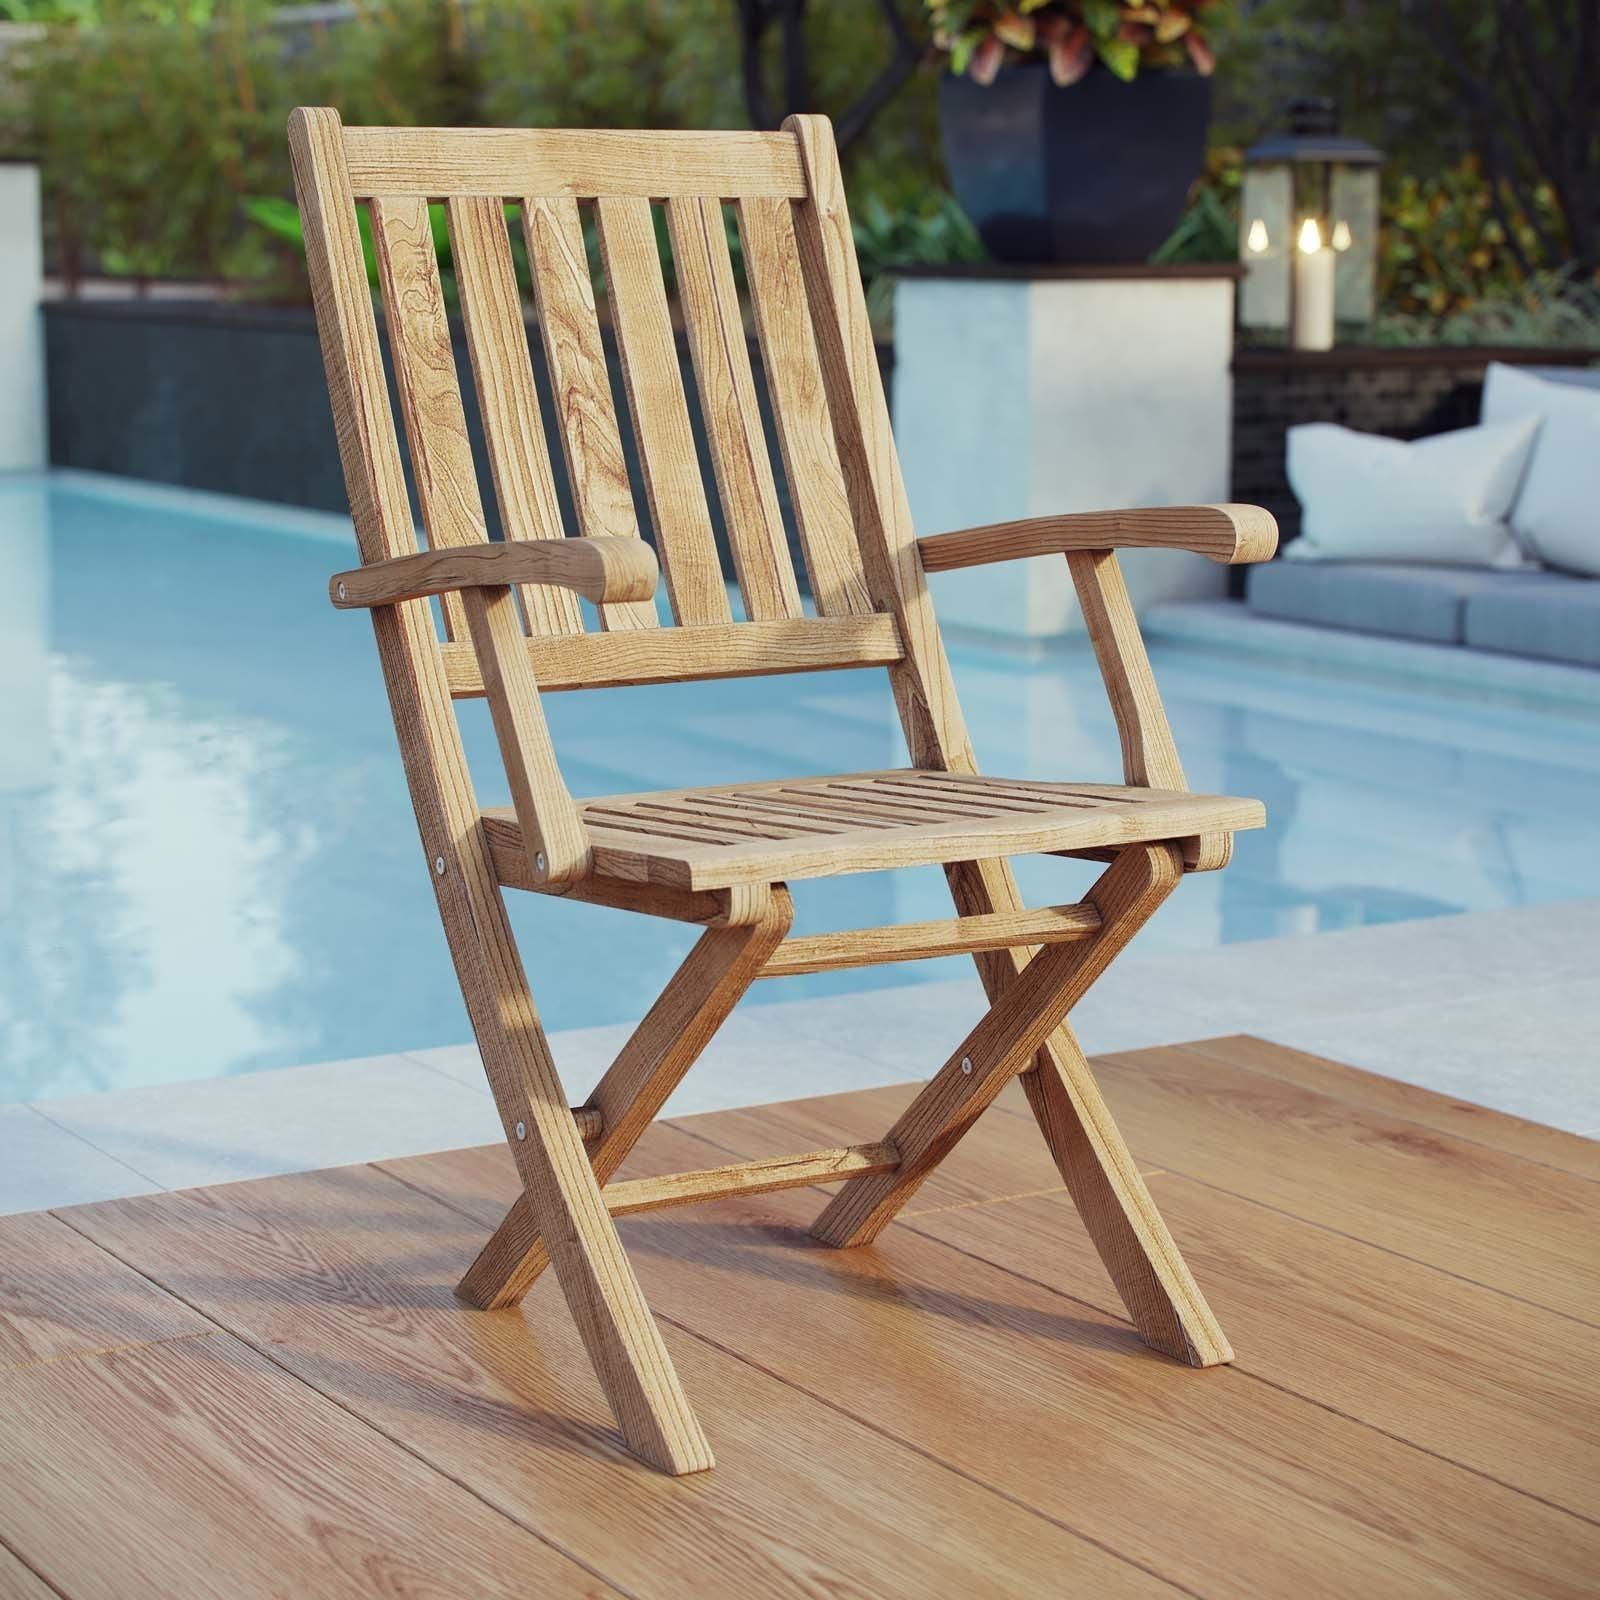 Shop Marina Outdoor Patio Teak Folding Chair - Free Shipping Today ...